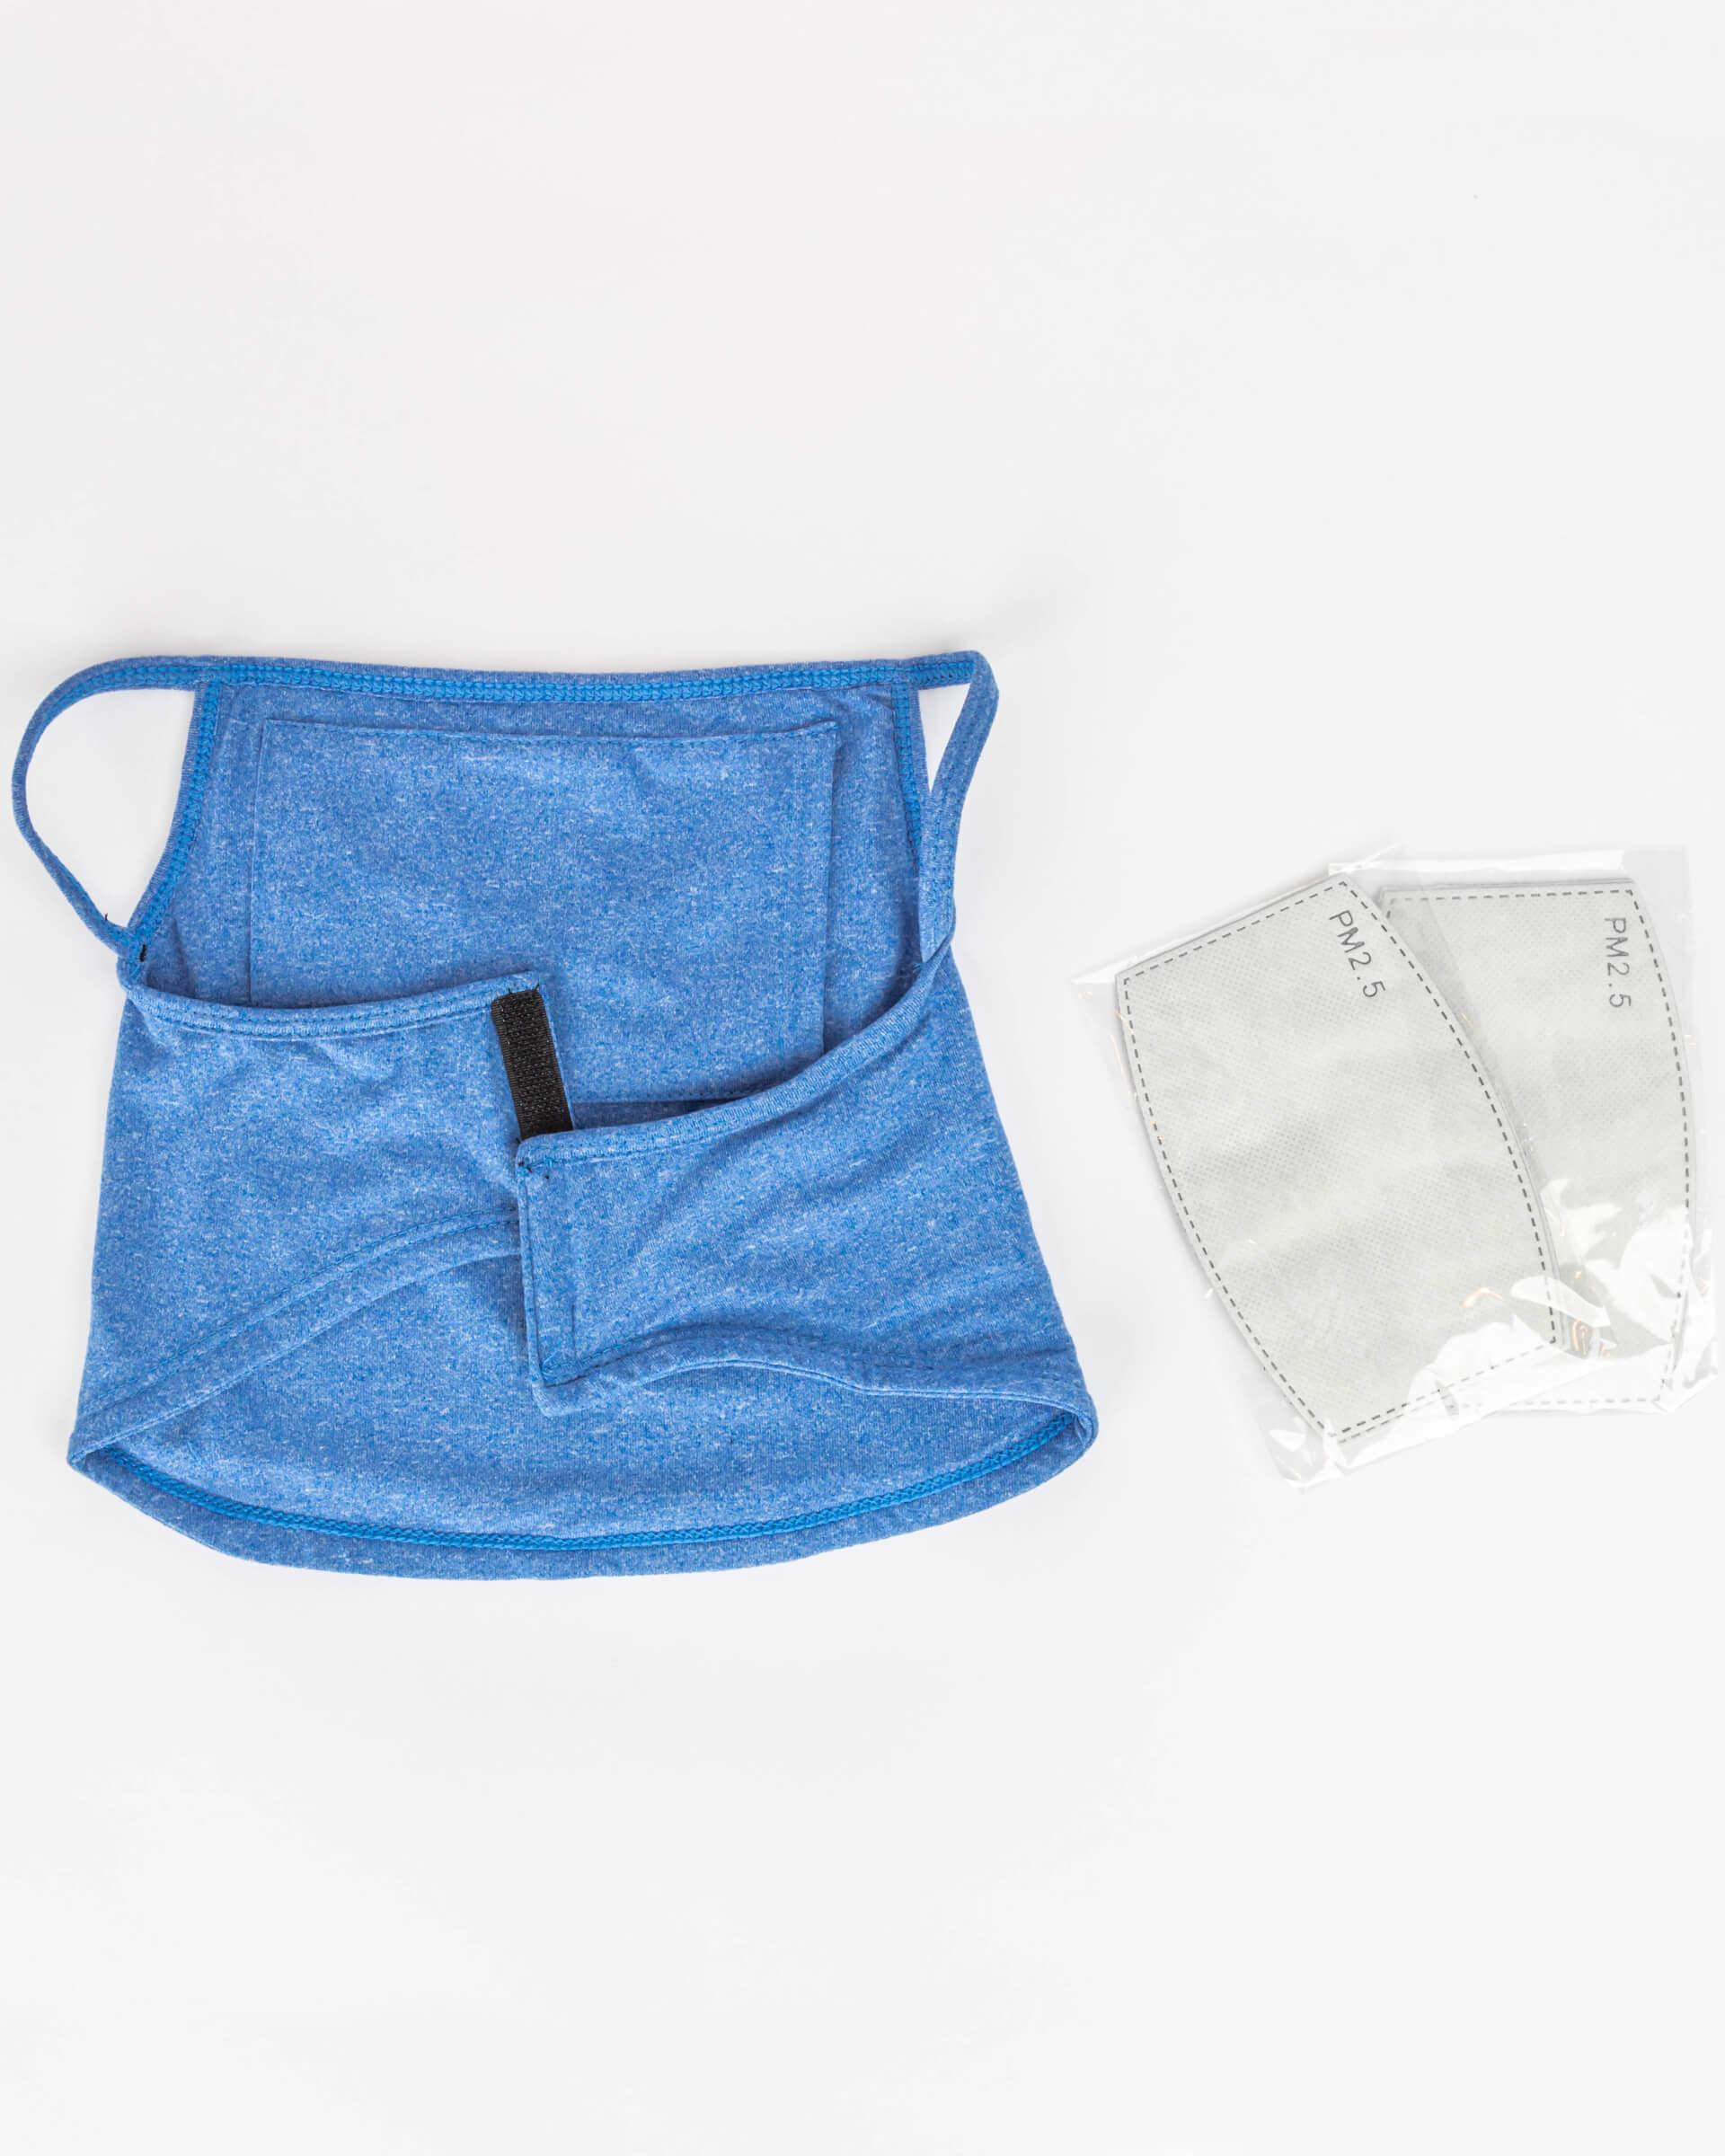 Boys' Protective Face Mask Gaiter w/ Filter Pocket - 2PC Set